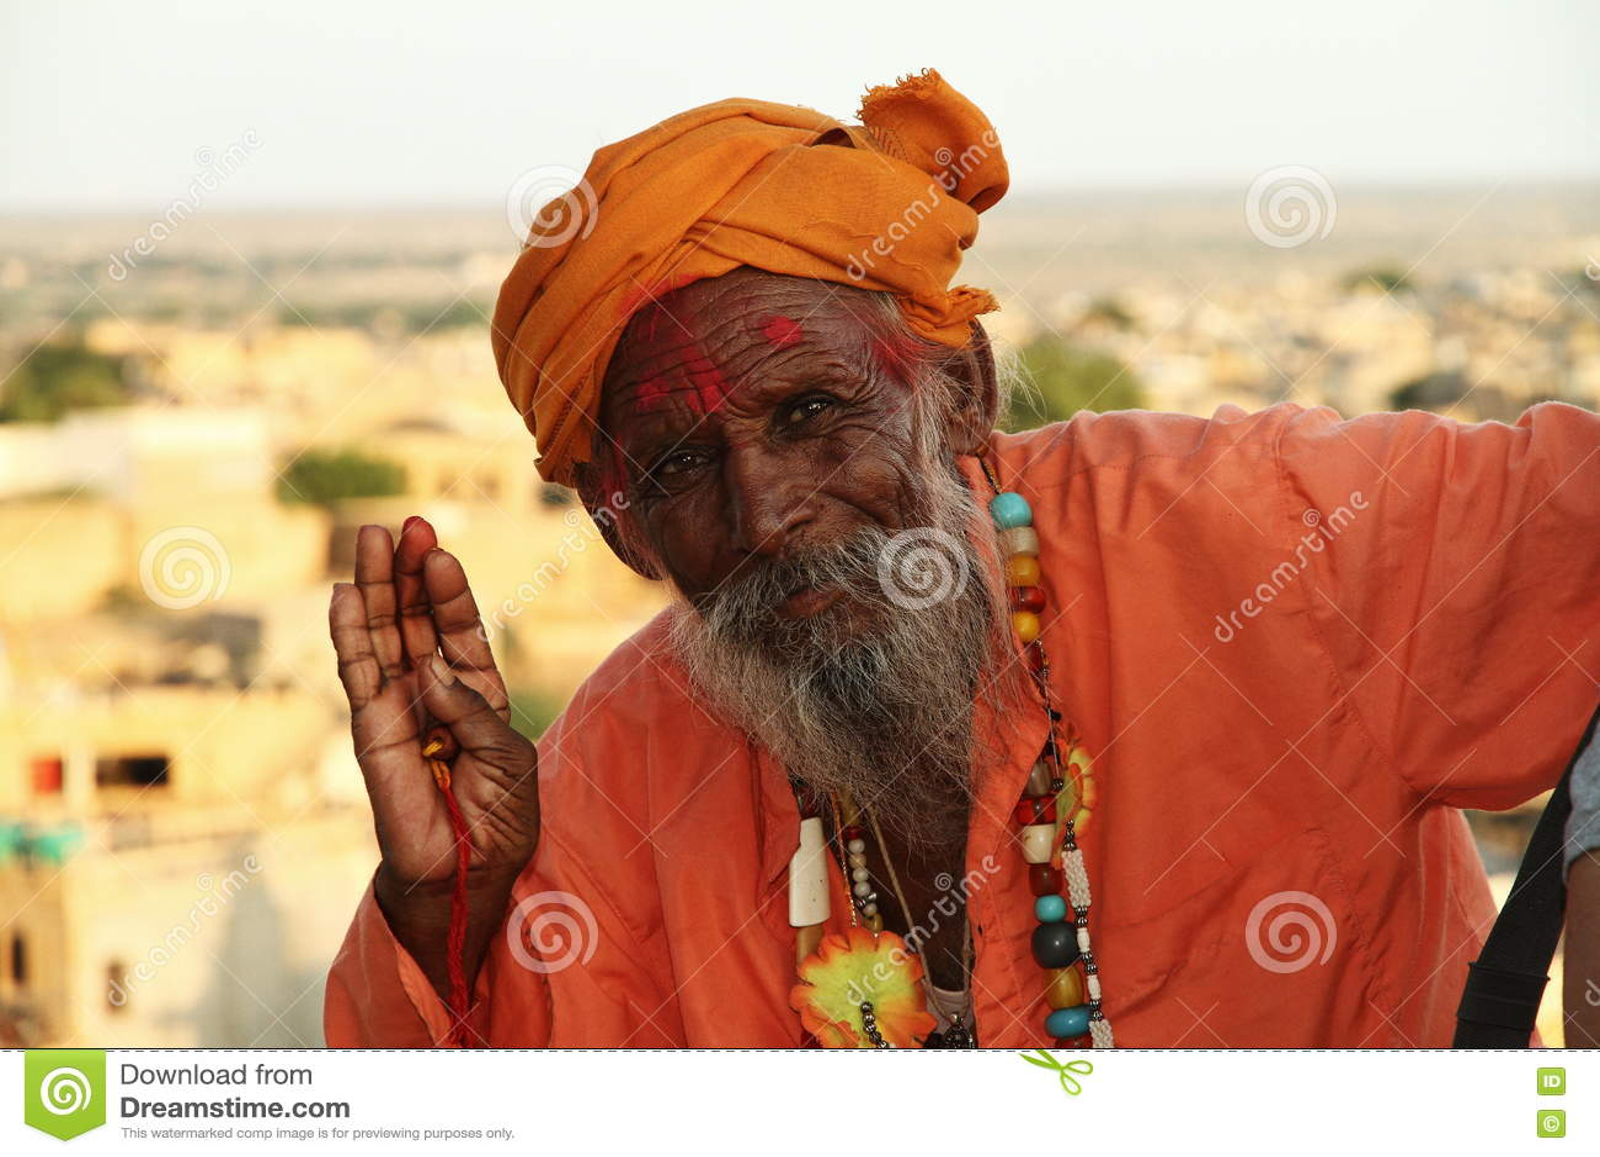 Hindu Shadu In Jaisalmer  Rajasthan Editorial Photo - Image